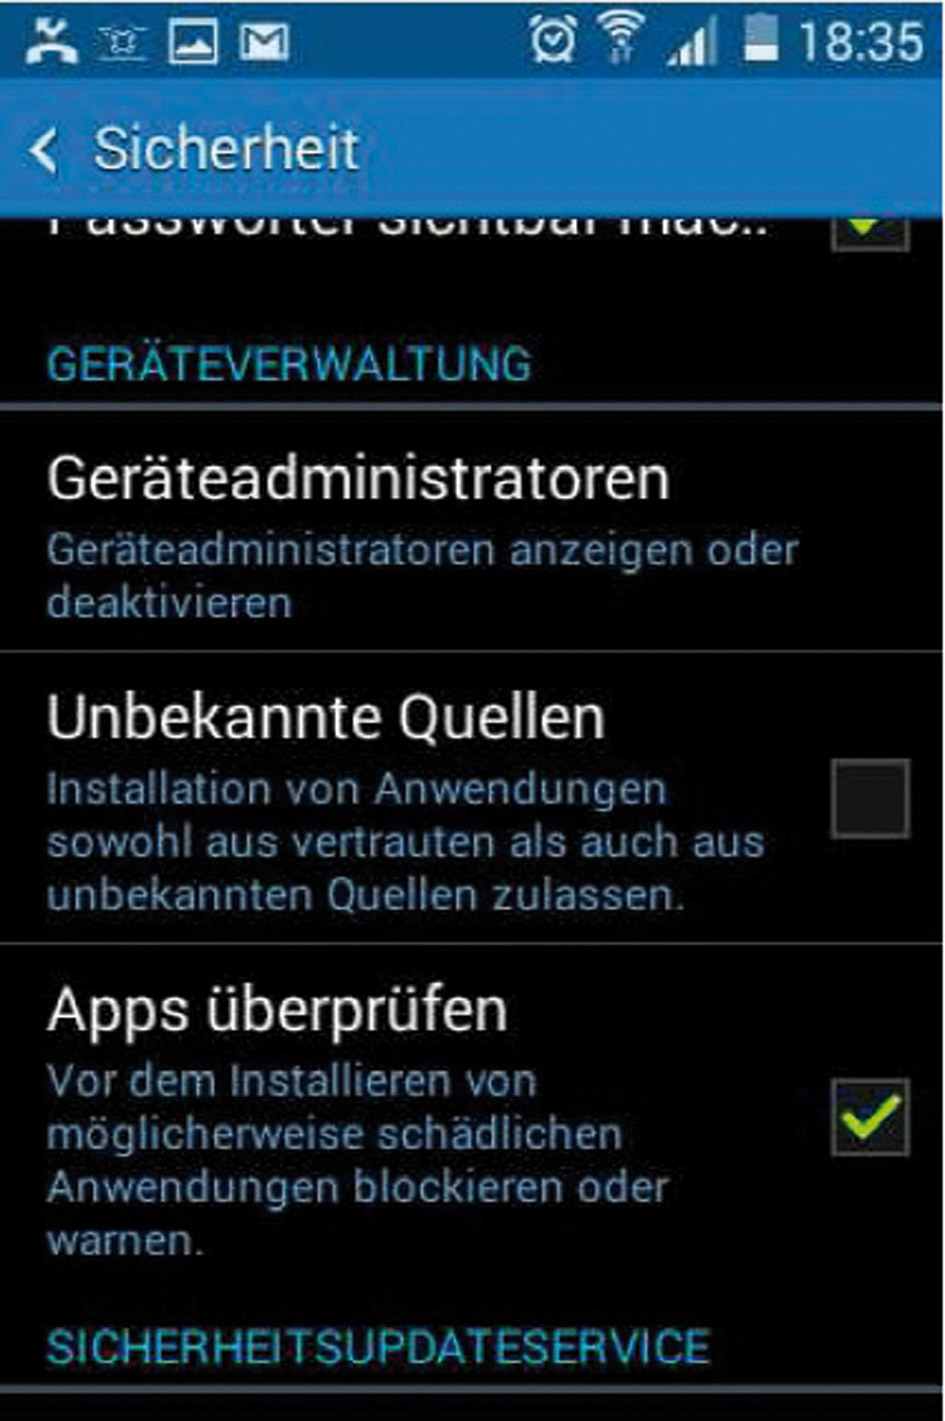 grimm_ueberwachung_1.tif_fmt1.jpg